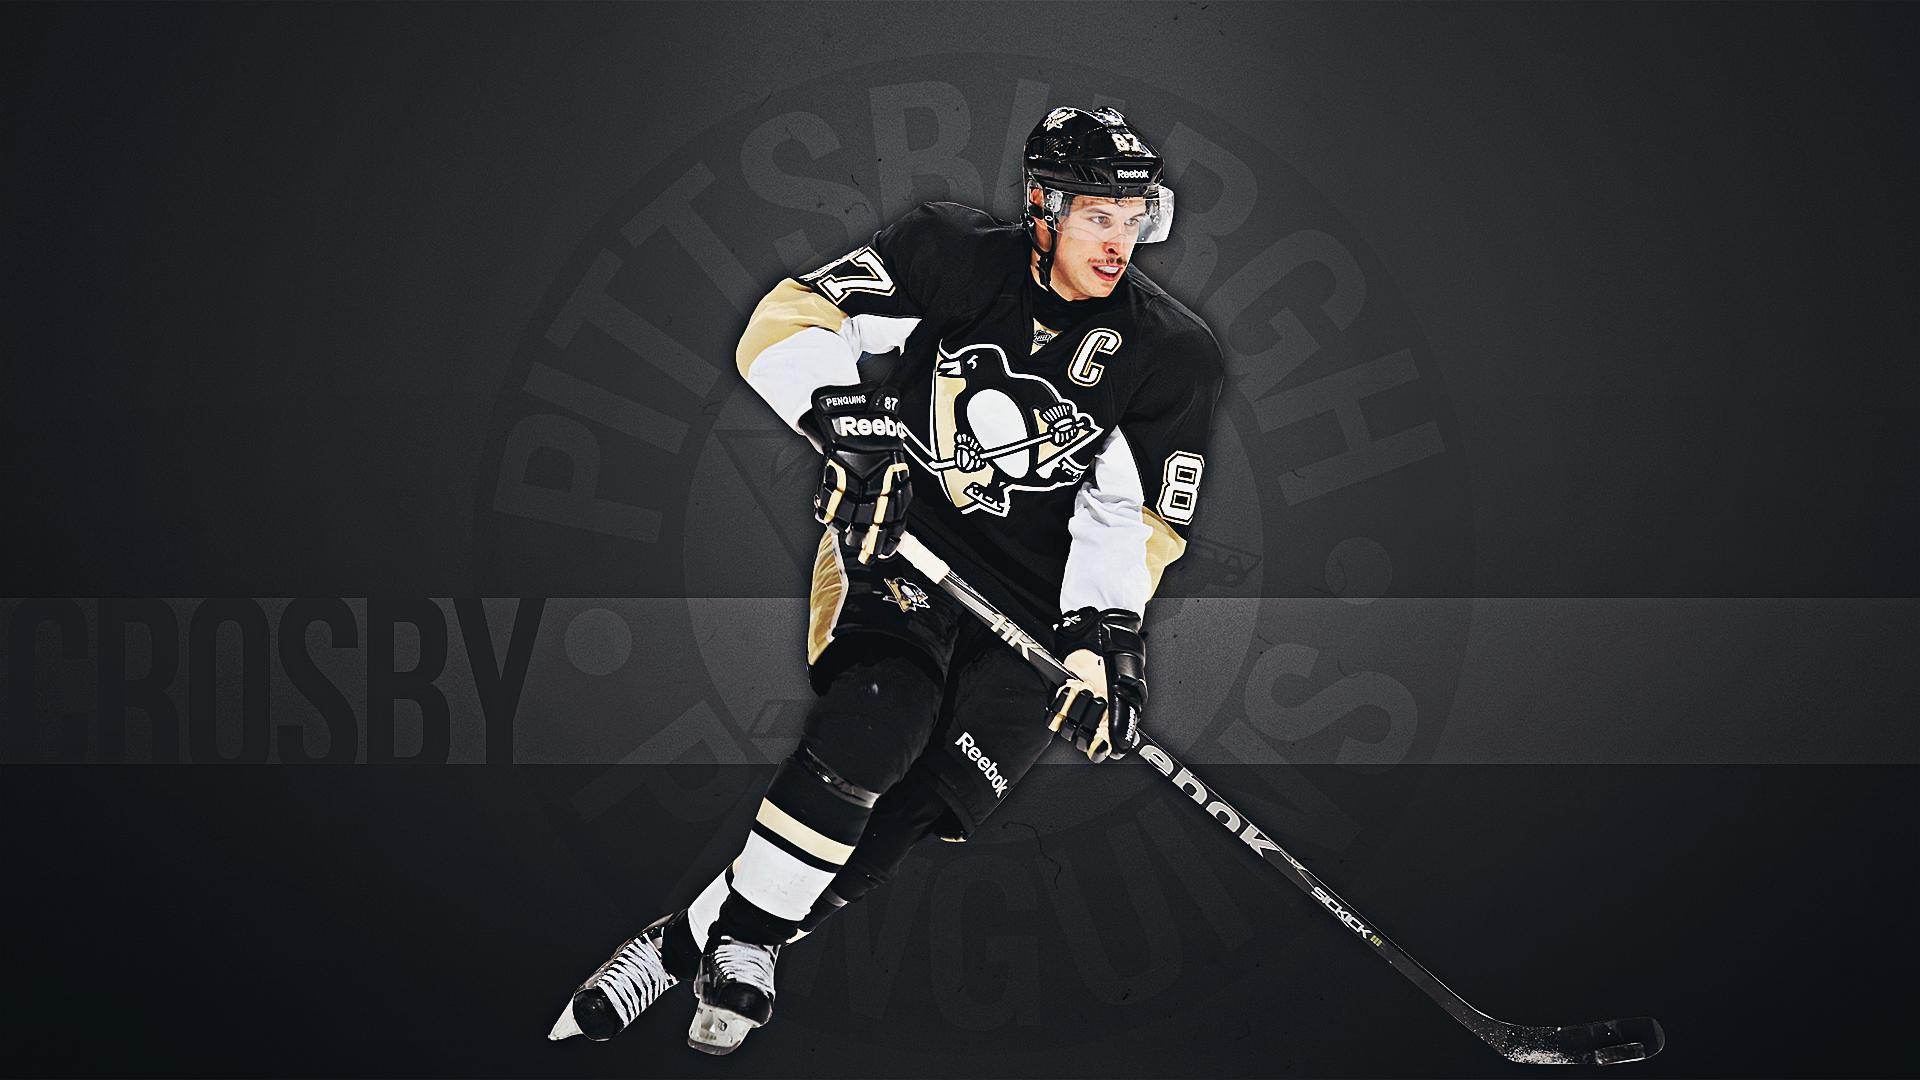 wallpaper.wiki-Desktop-Pittsburgh-Penguins-Backgrounds-PIC-WPE001819